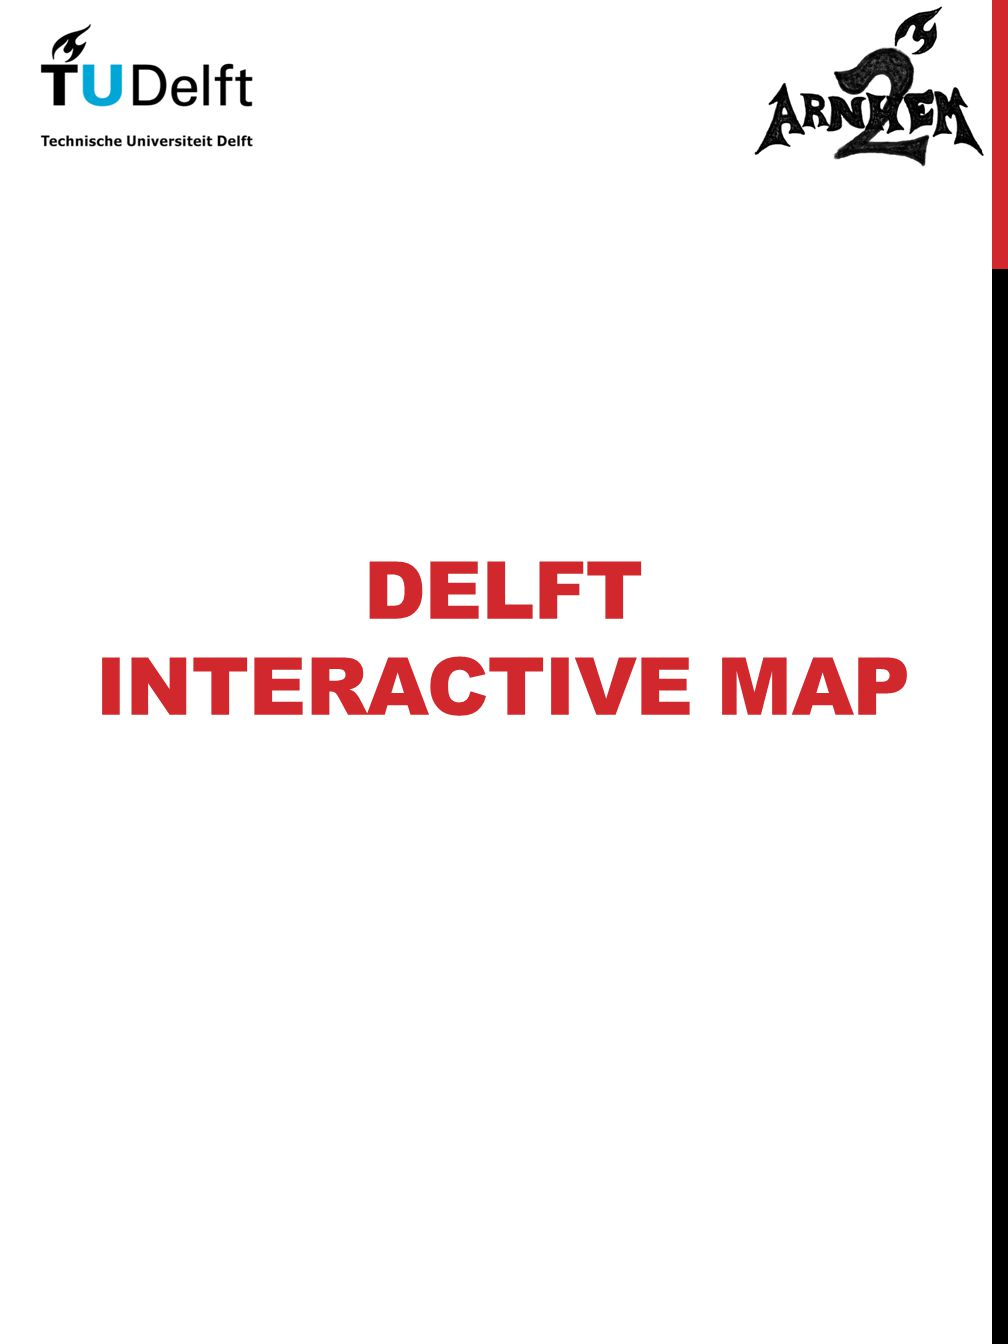 DELFT INTERACTIVE MAP